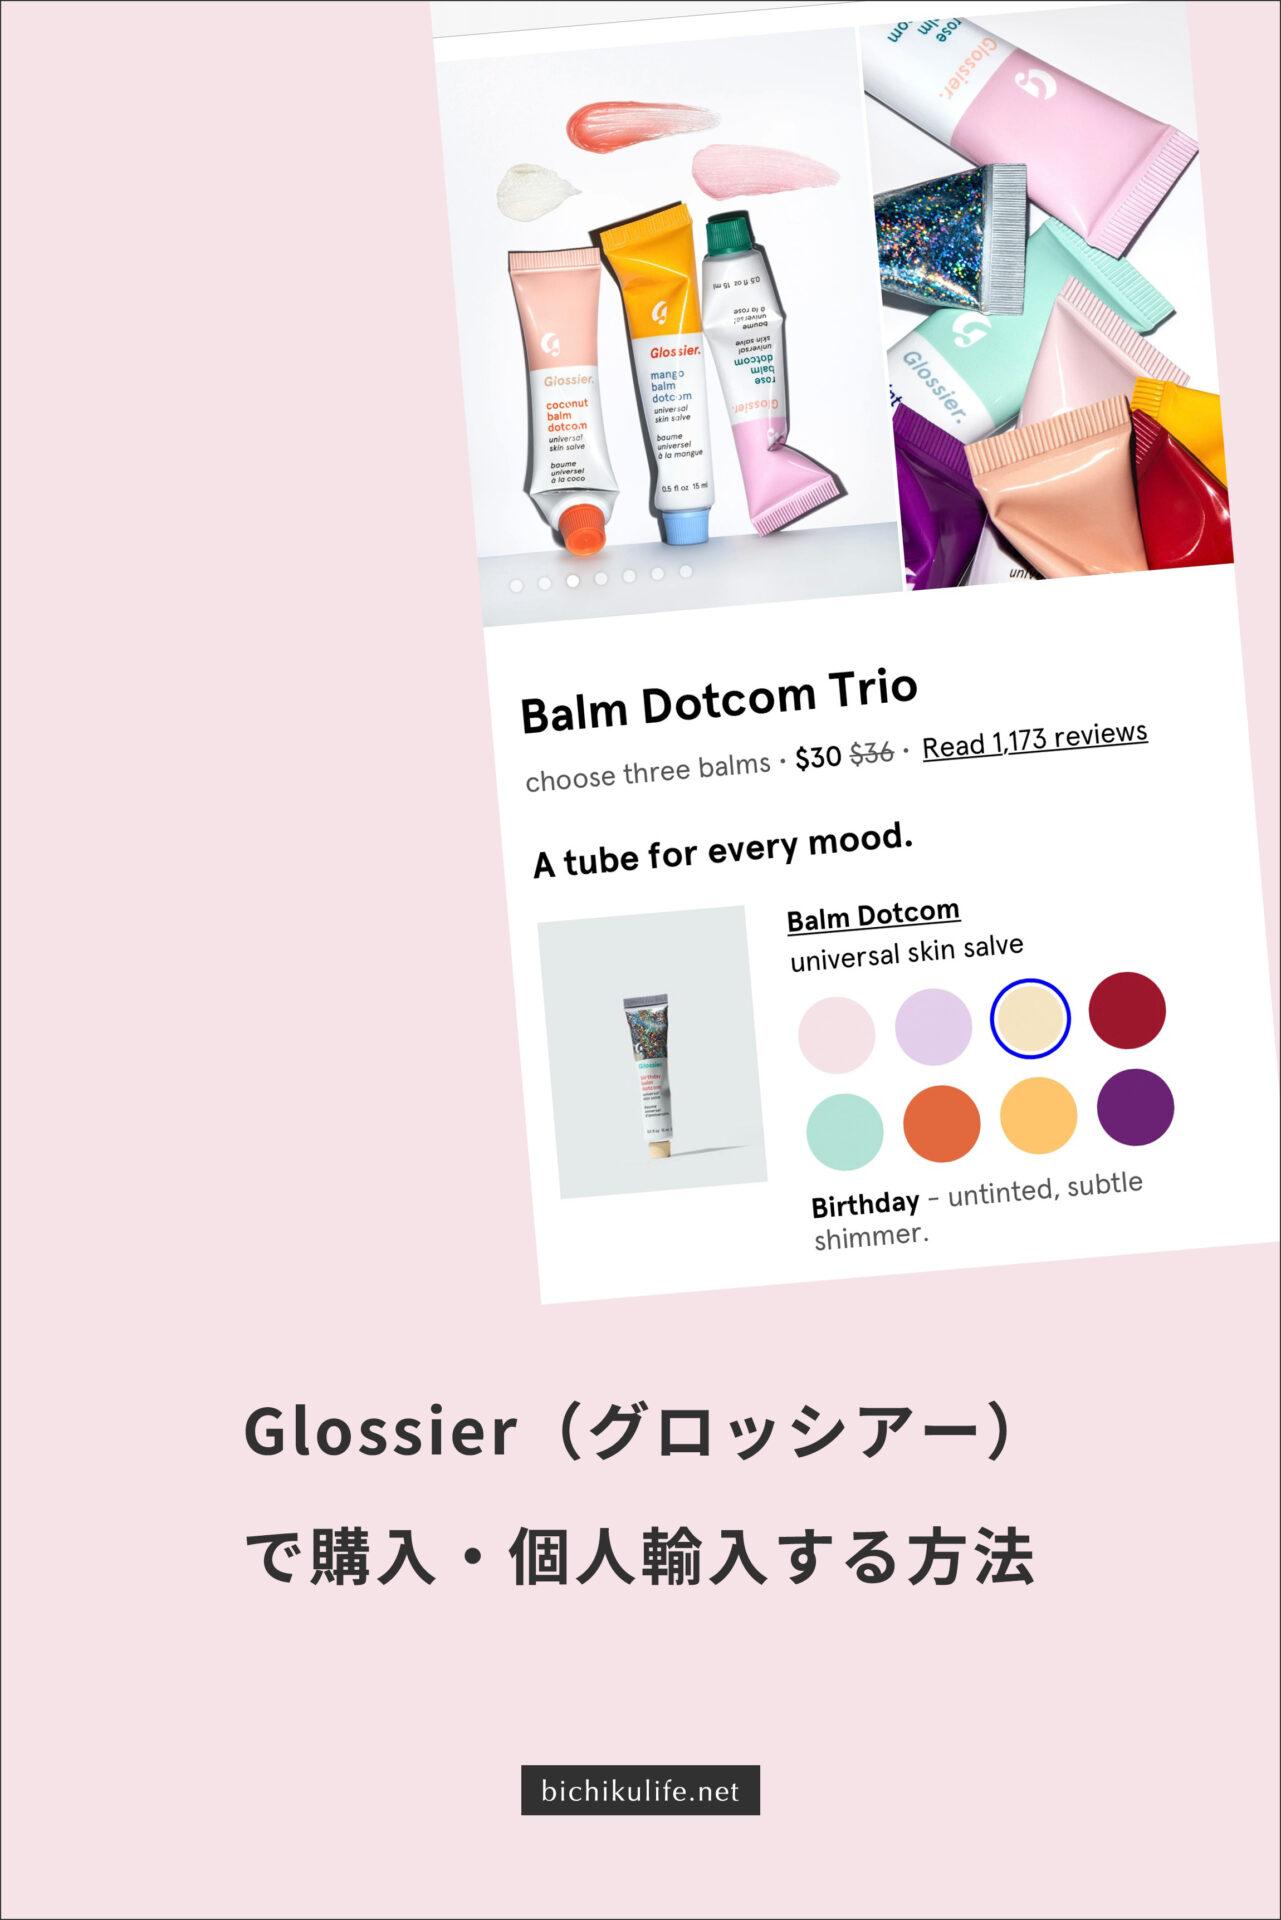 Glossier グロッシアーのコスメを海外公式通販サイトで購入する方法